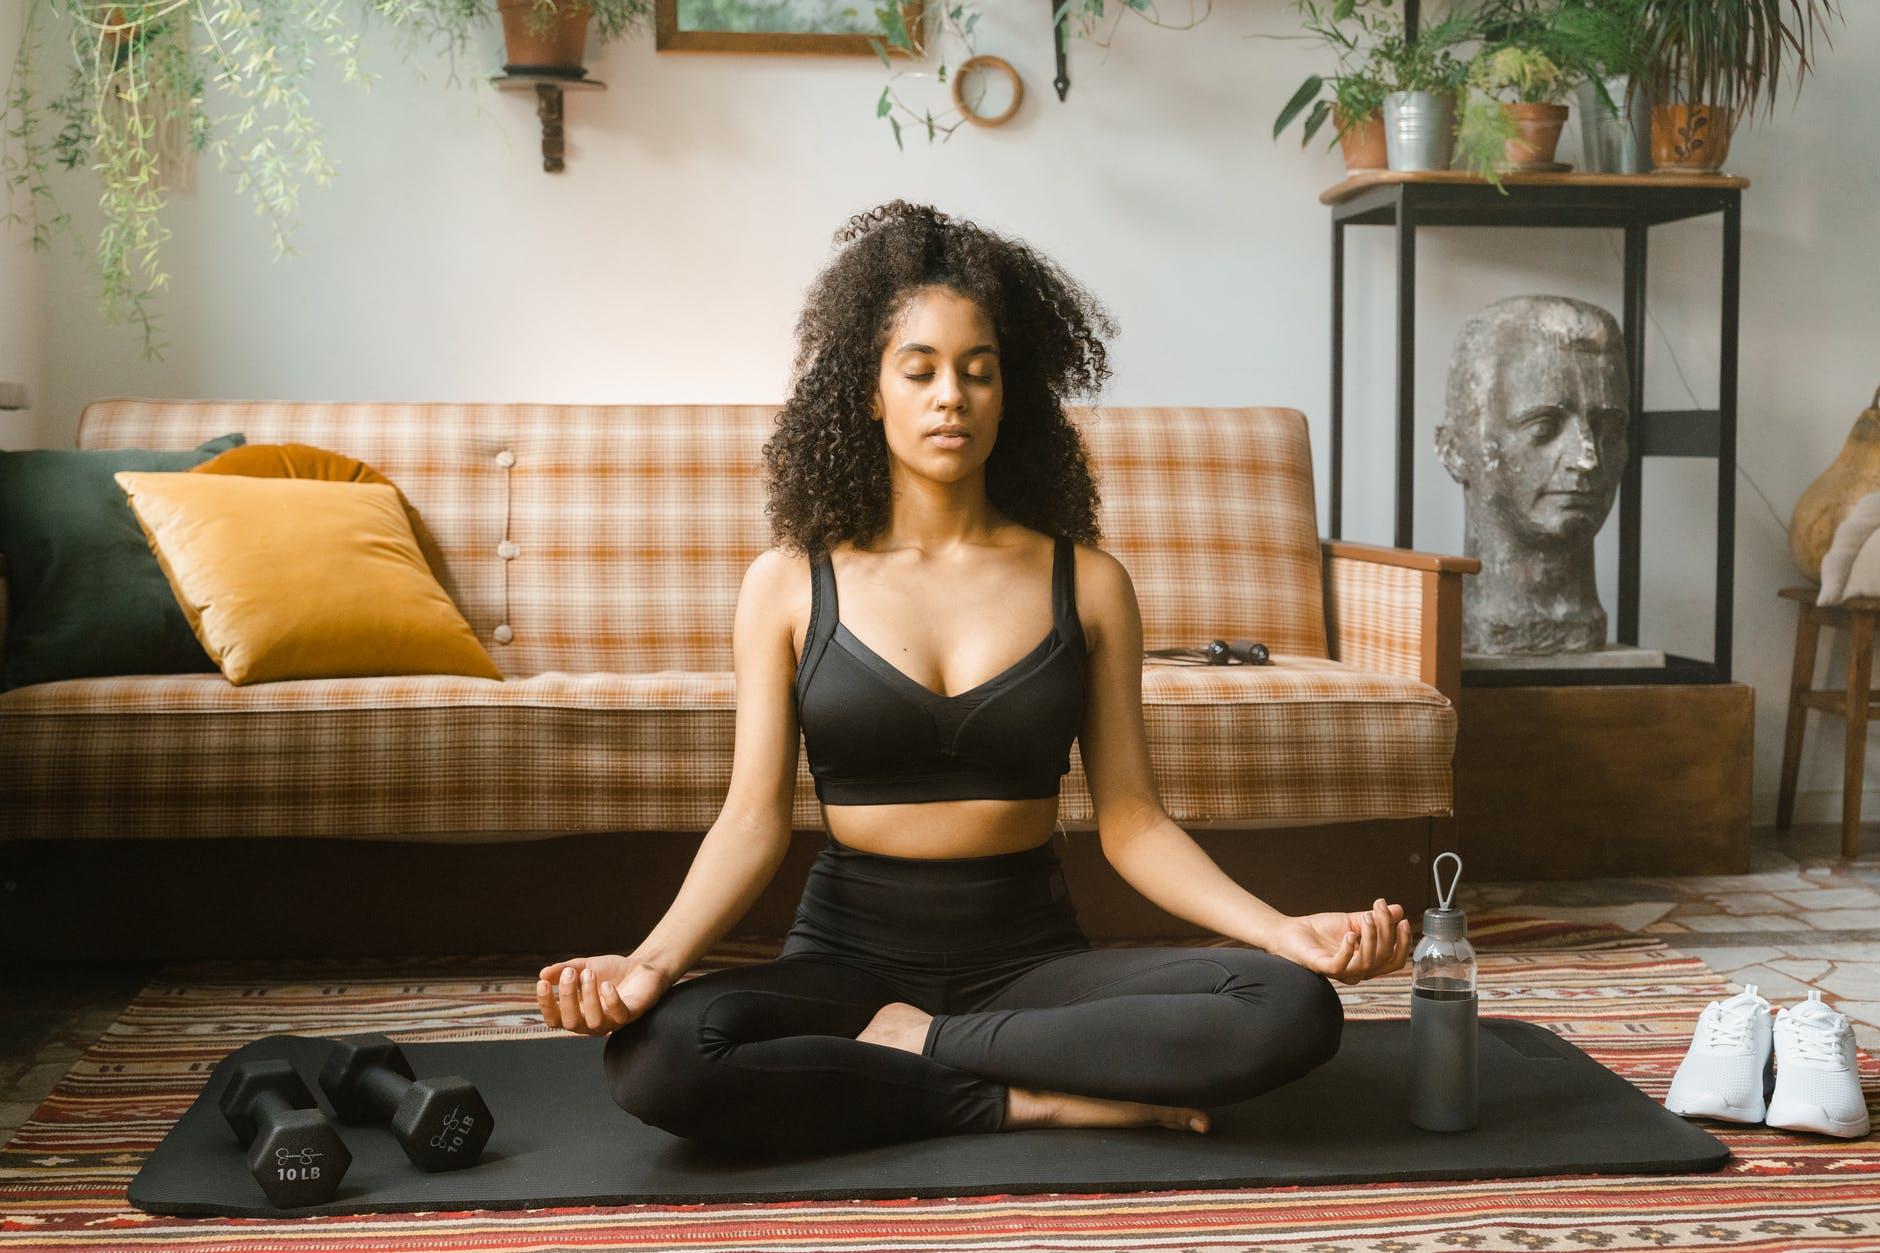 woman in black activewear meditating indoors